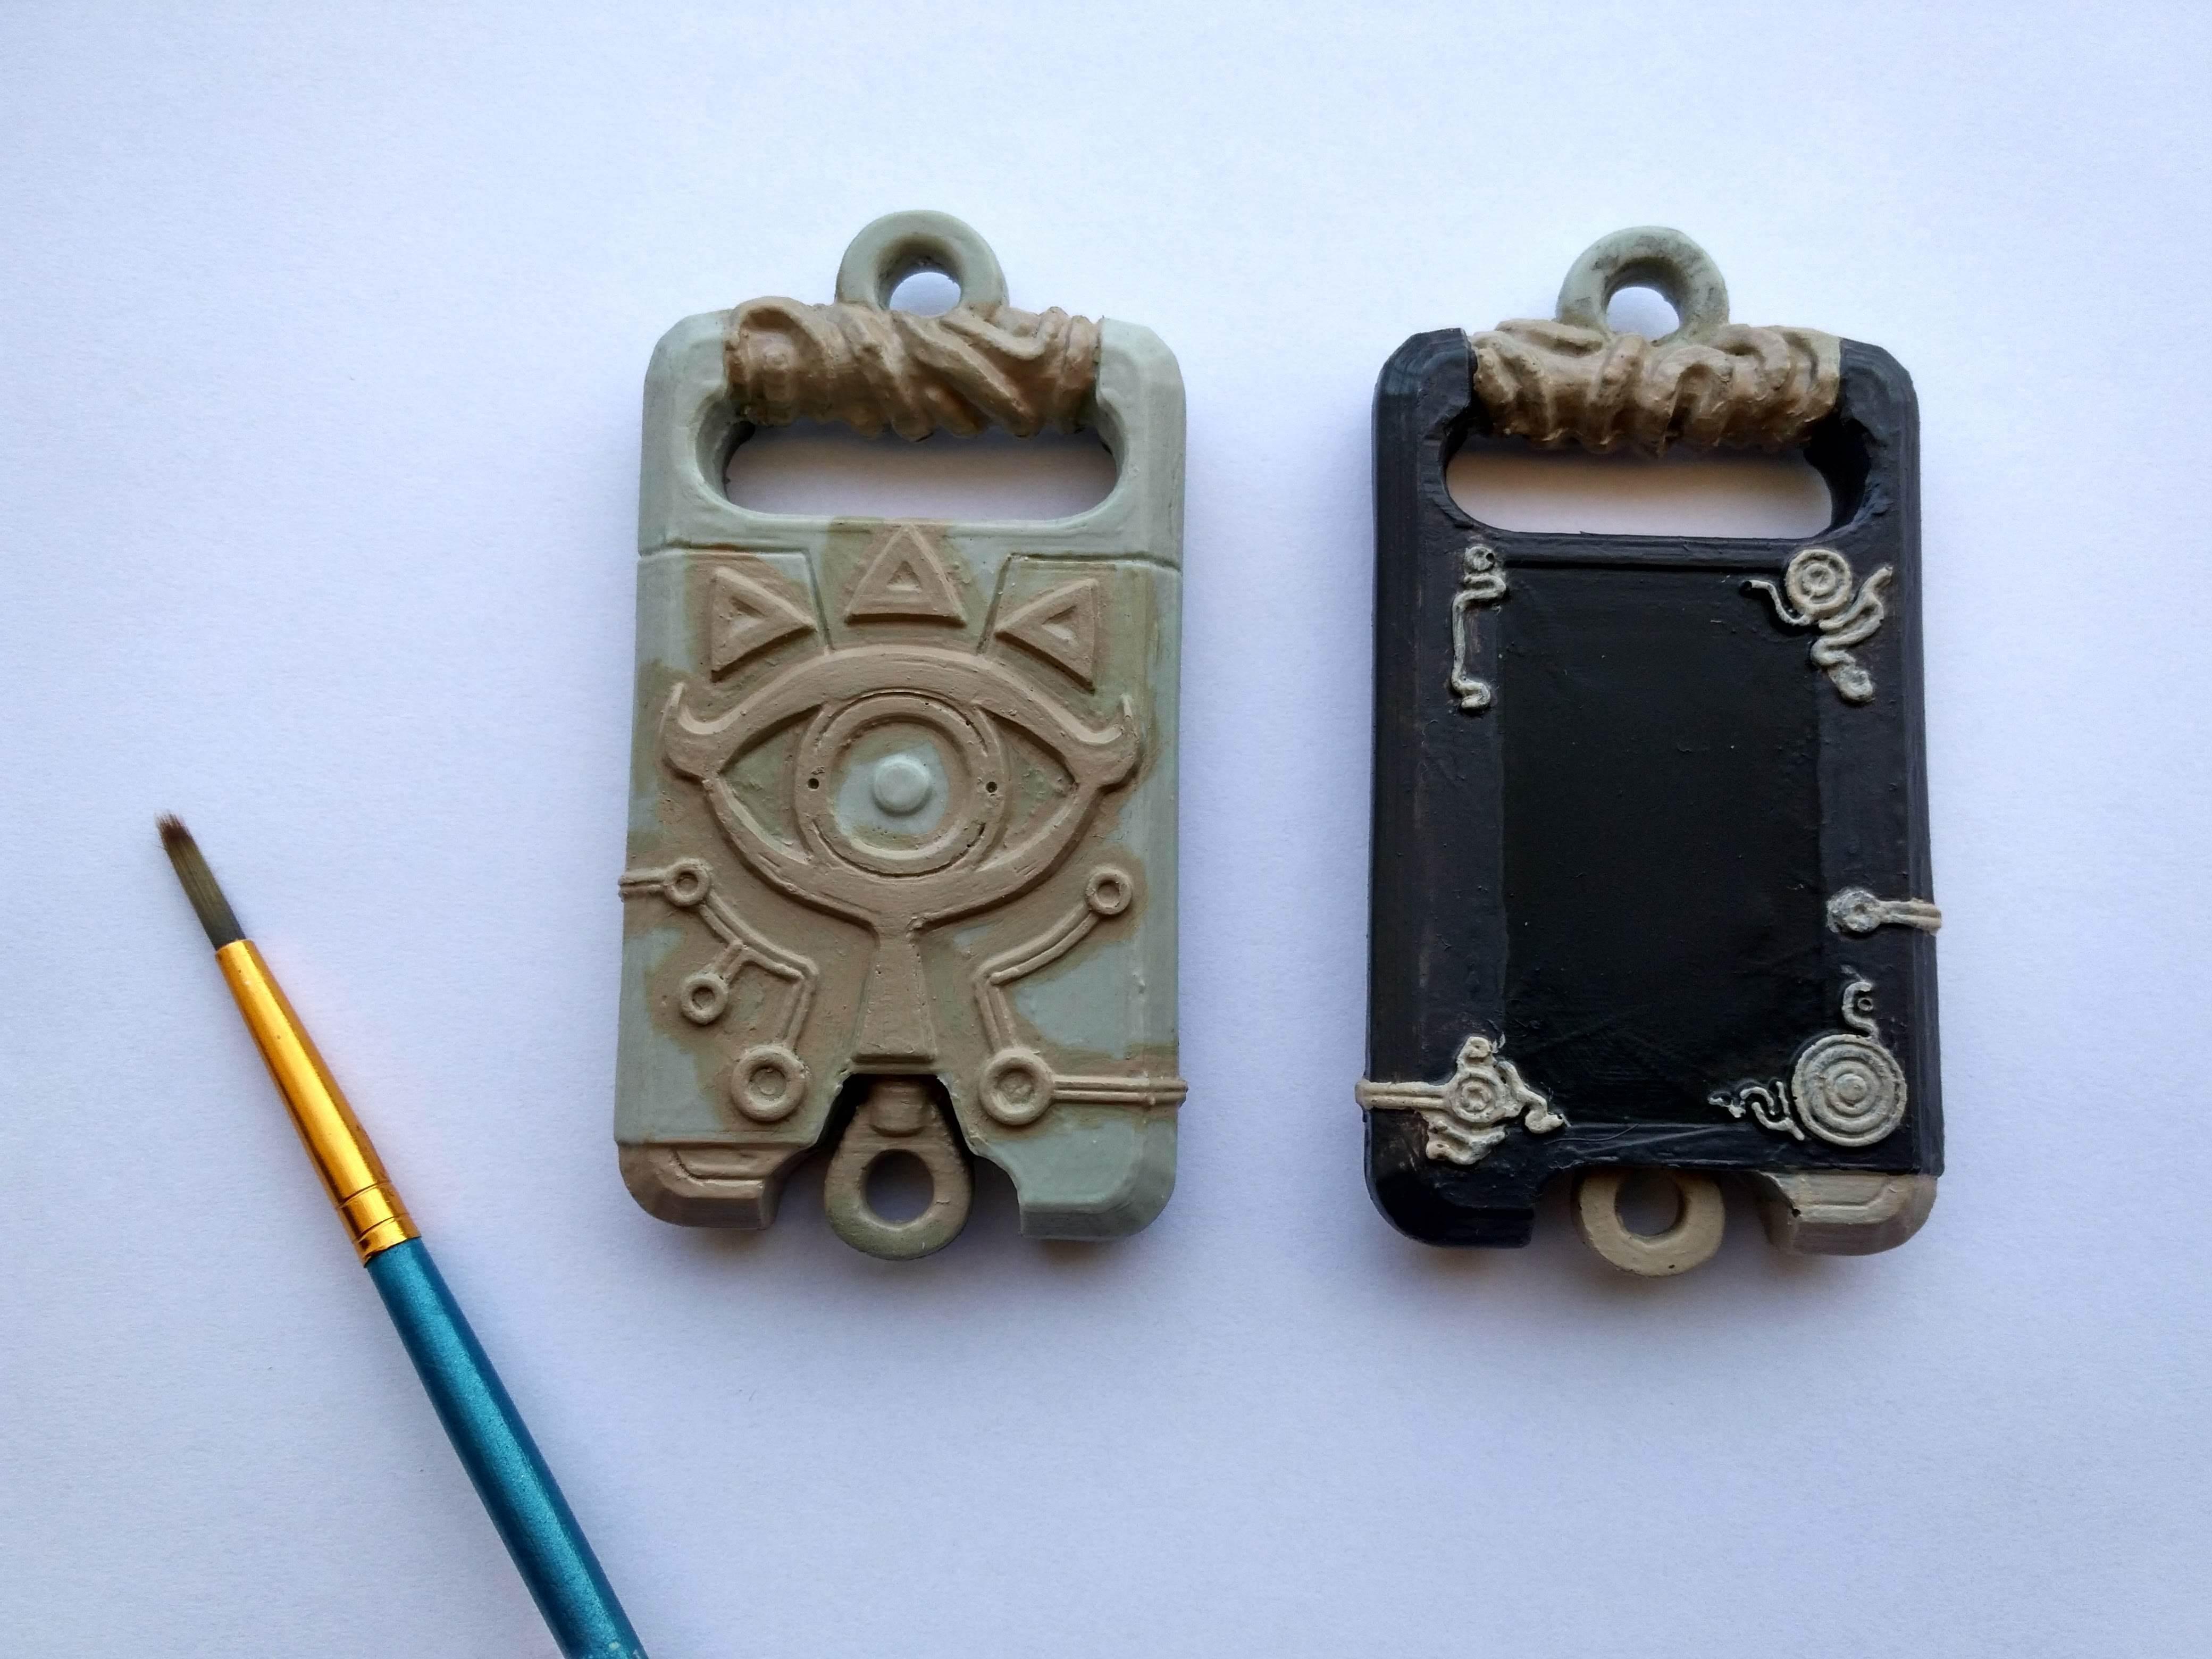 IMG_20181007_164810.jpg Download STL file Sheikah slate Keychain version (Keychain) • 3D print design, Shigeryu